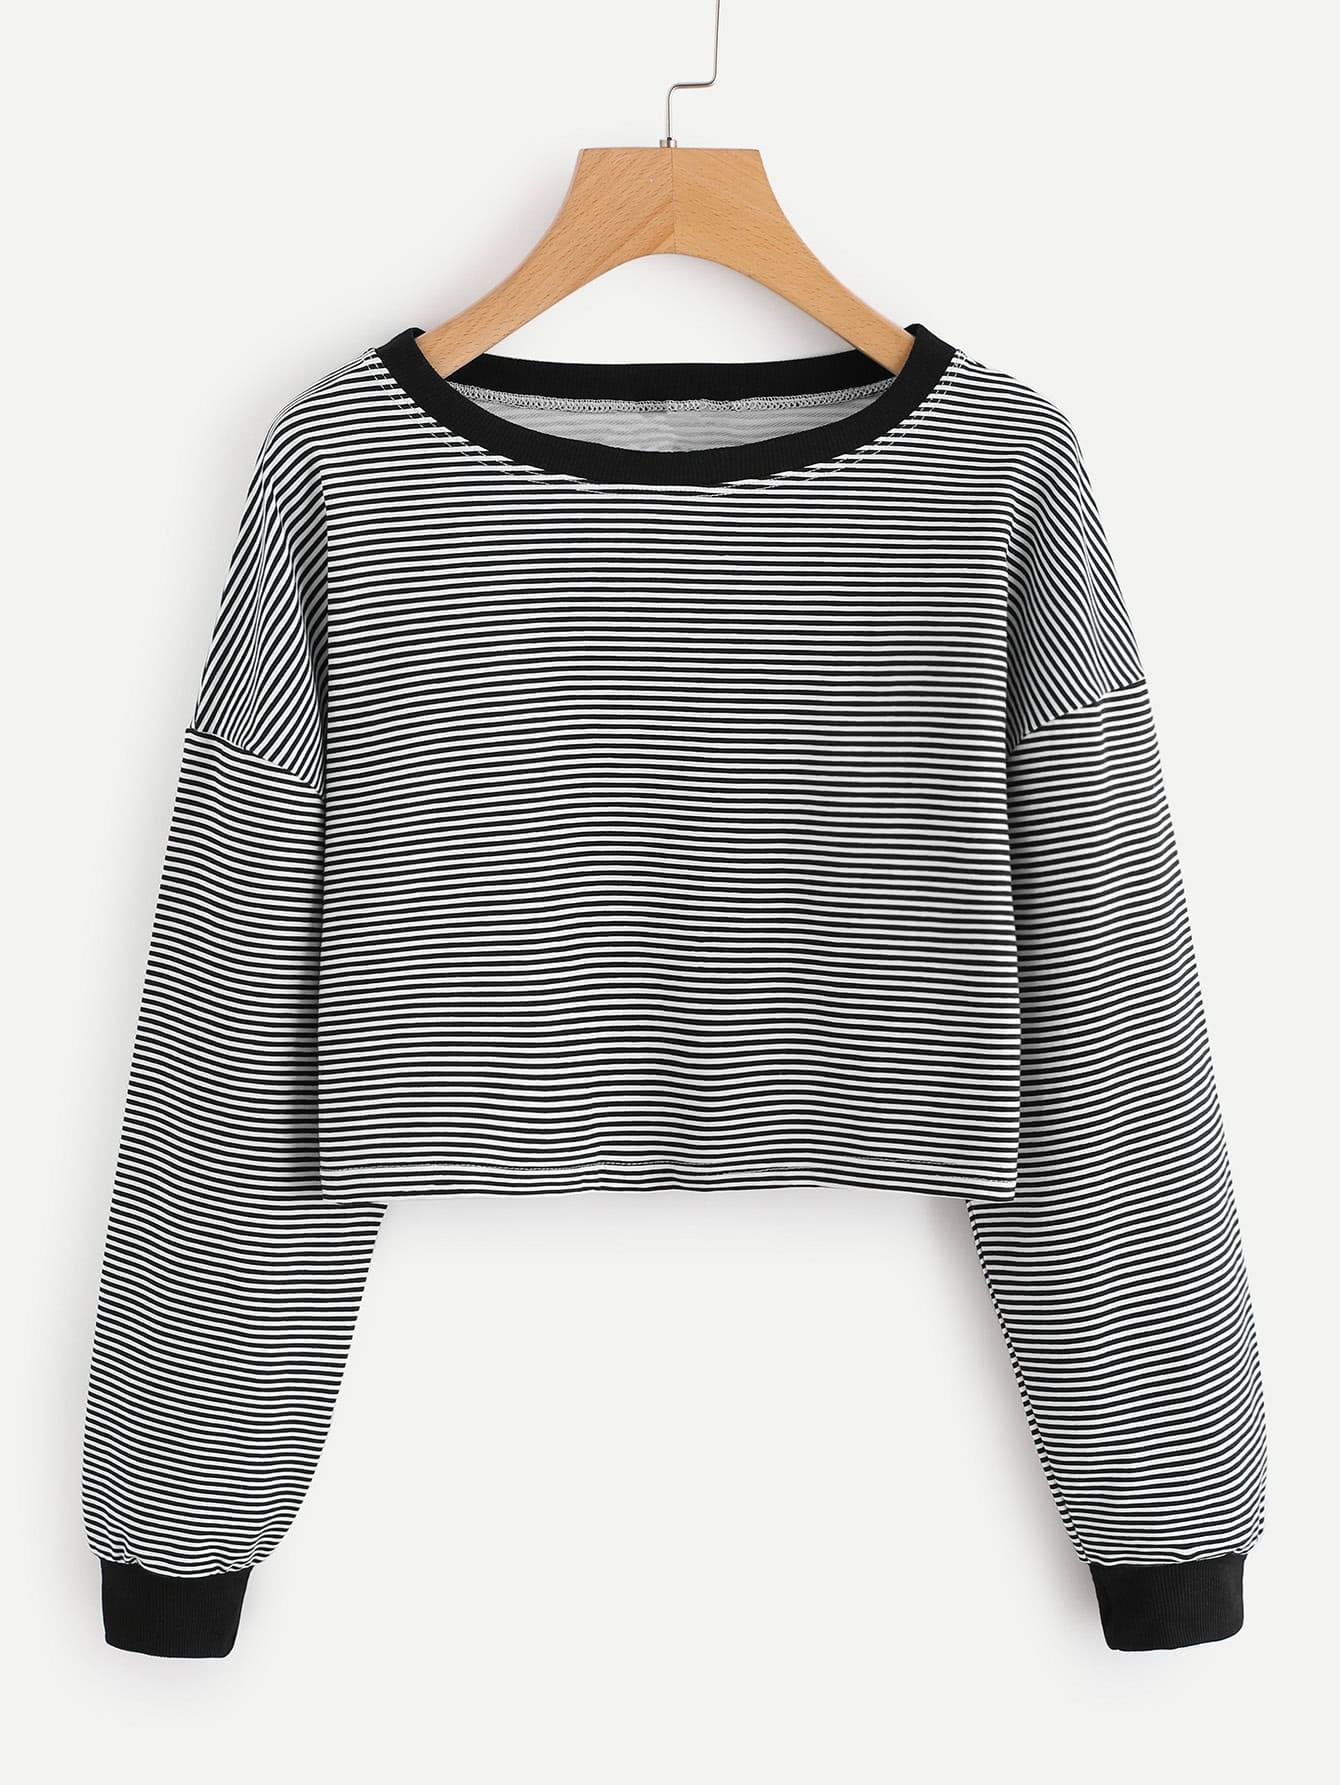 Contrast Trim Drop Shoulder Striped Crop Pullover drop shoulder scalloped trim crop sweatshirt